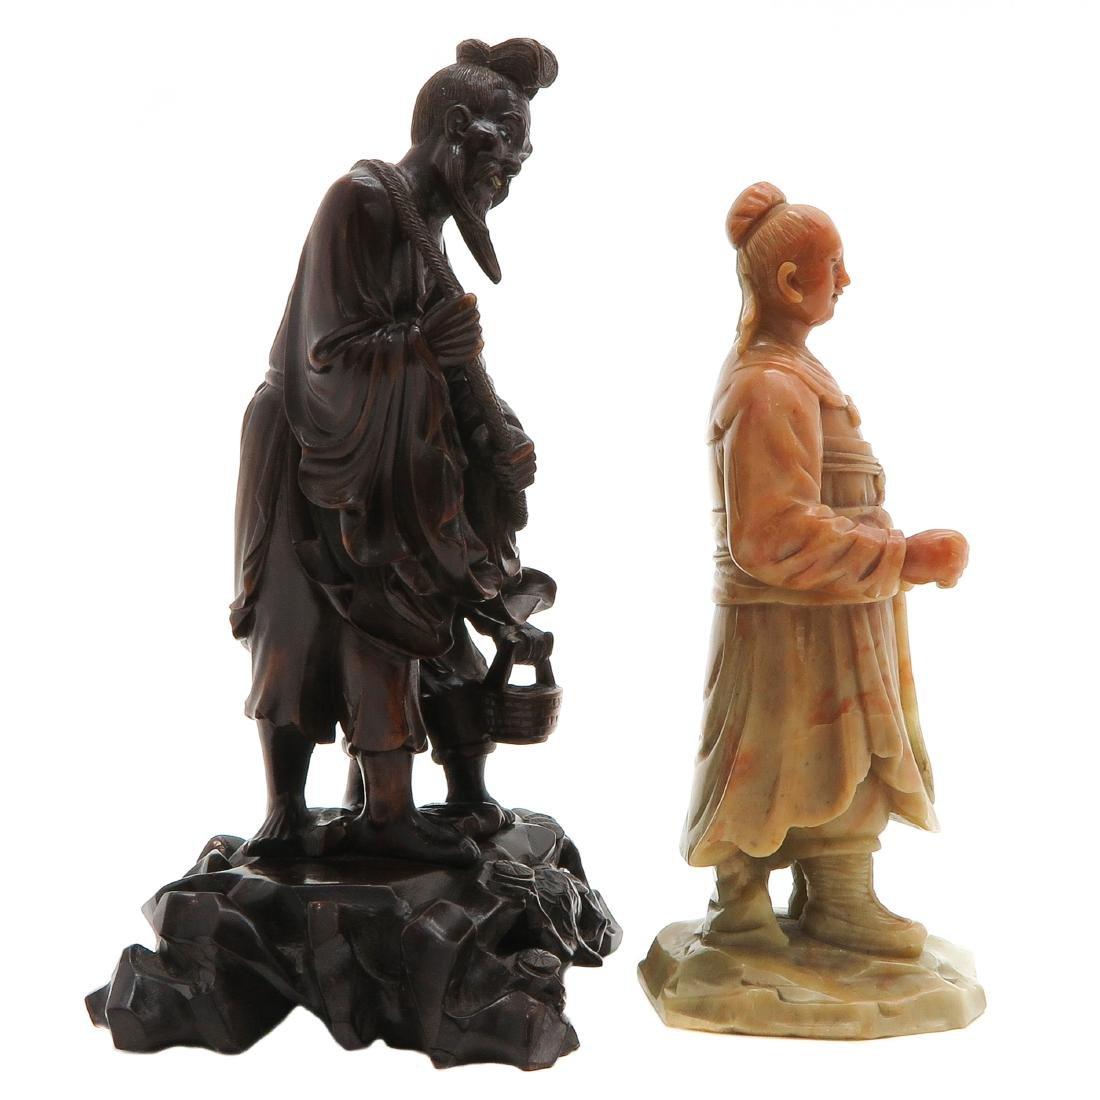 Lot of 2 Sculptures - 3